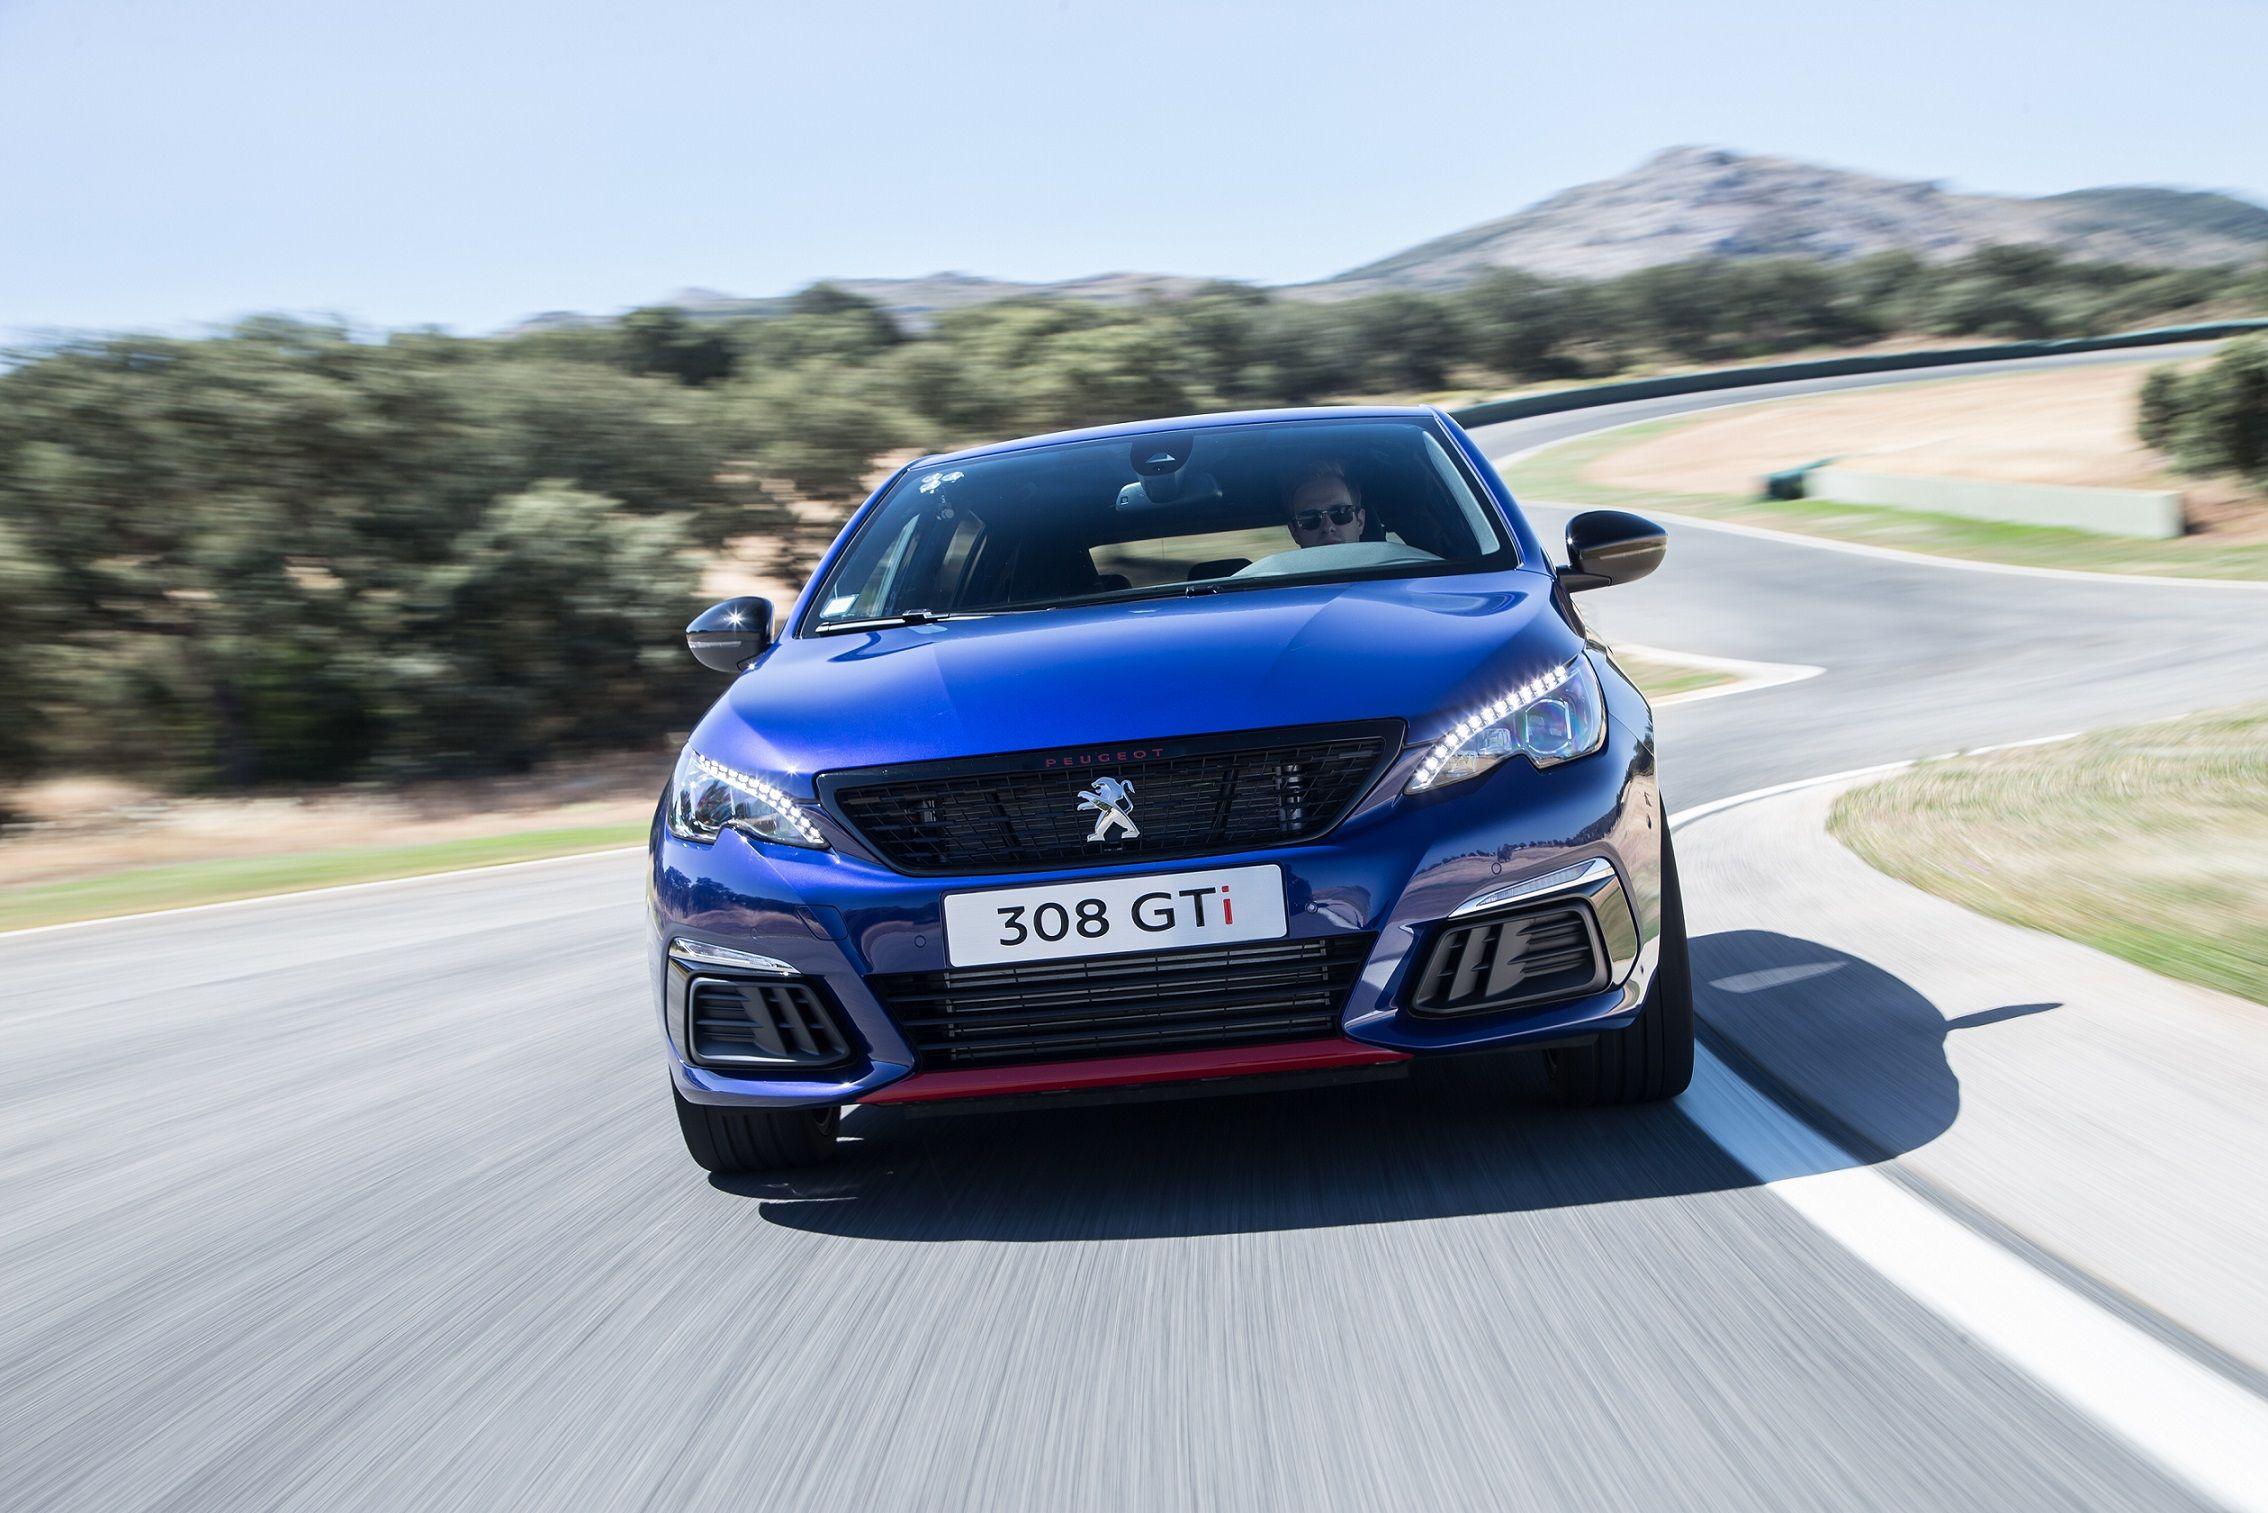 Nuevo Peugeot 308 GTi by Peugeot Sport: deportividad sin concesiones